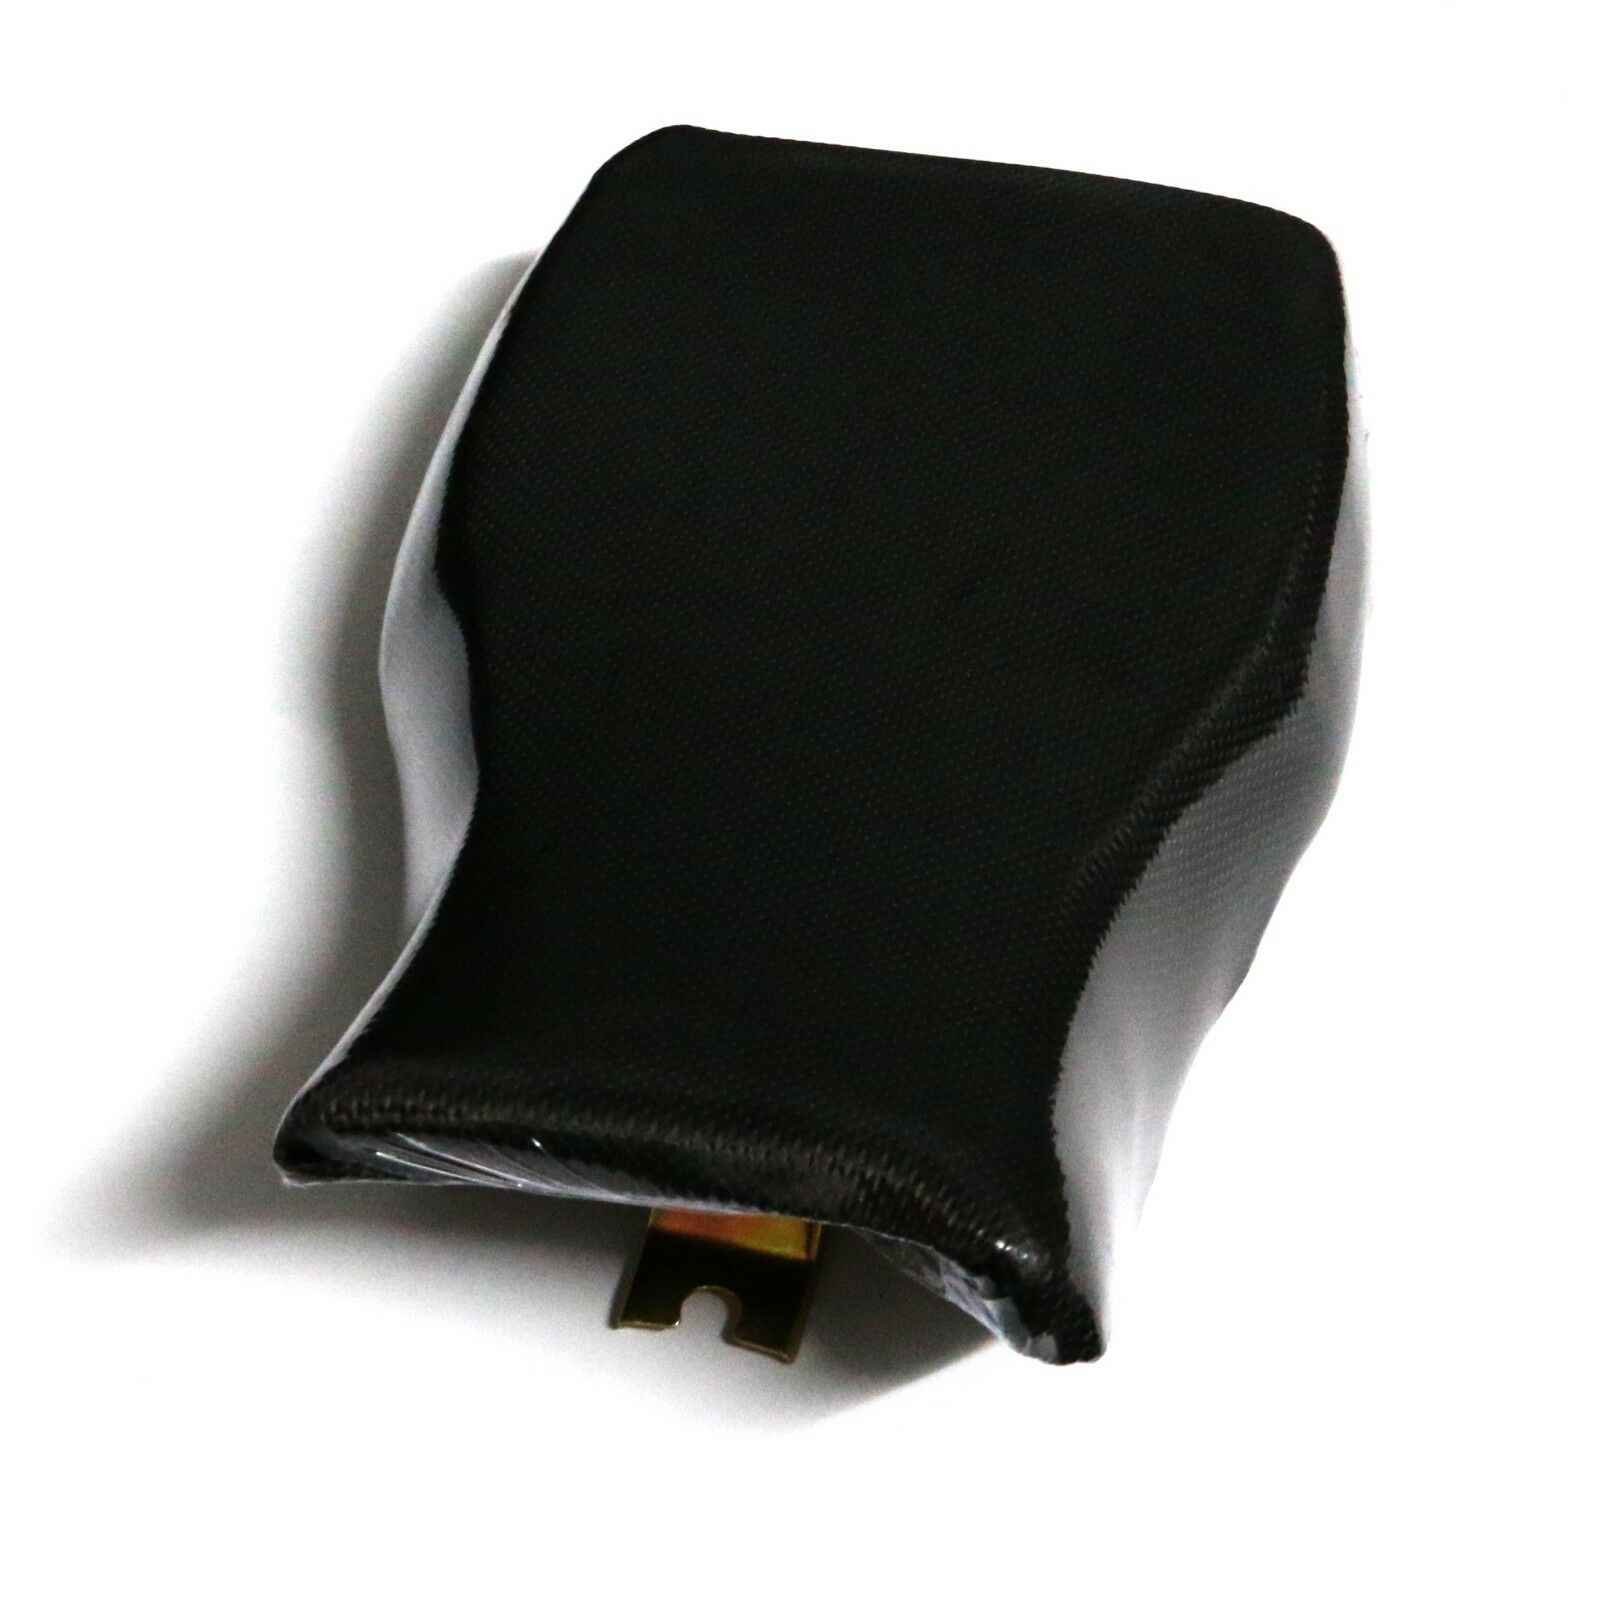 50cc 70cc 90cc 110cc 125cc UTV ATV Seat Pad For ROKETA KAZUMA SUNL TAOTAO/_shha